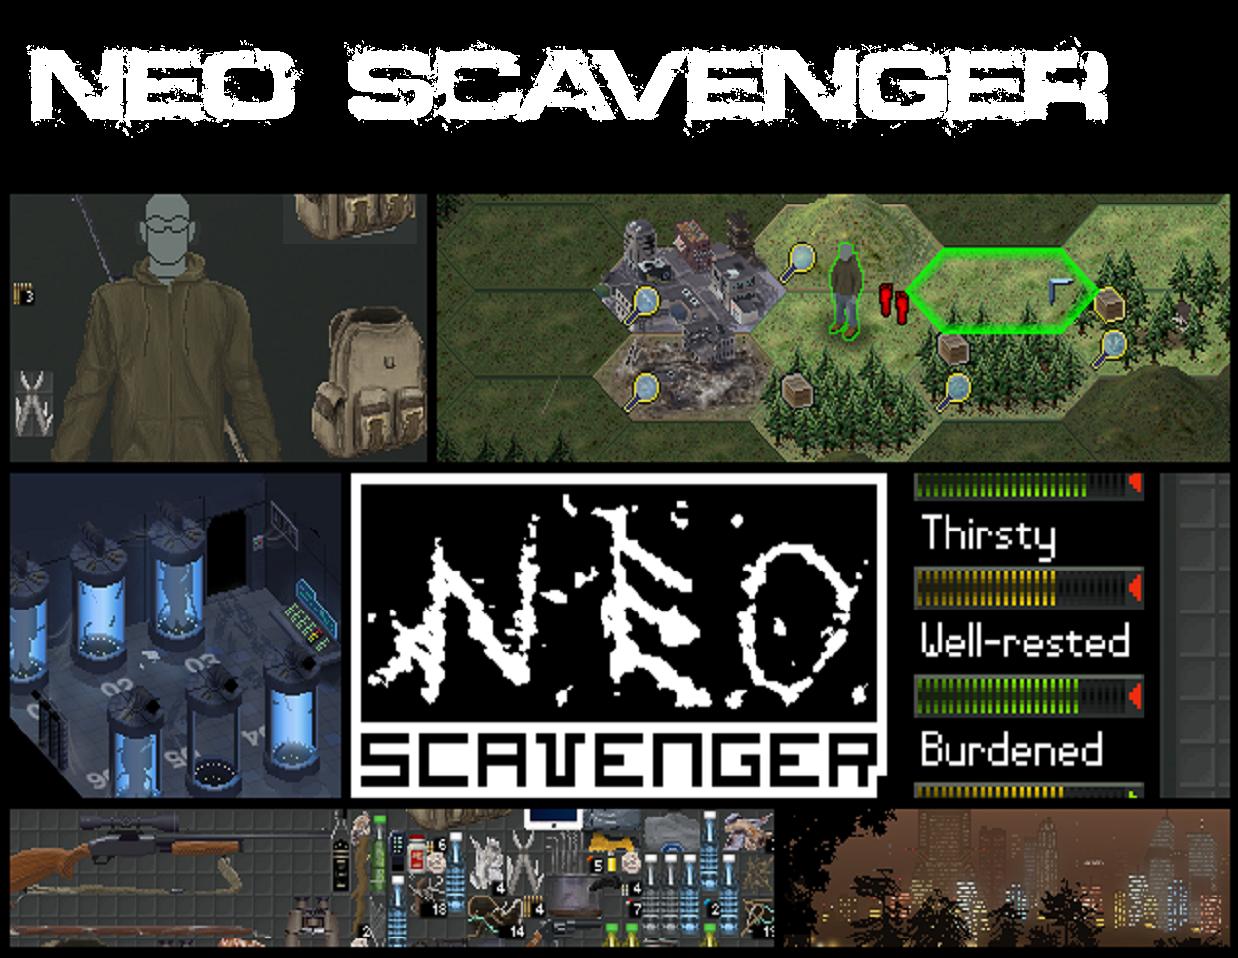 http://radioaktywne-recenzje.blogspot.com/2014/05/neo-scavenger-kompedium-modow.html